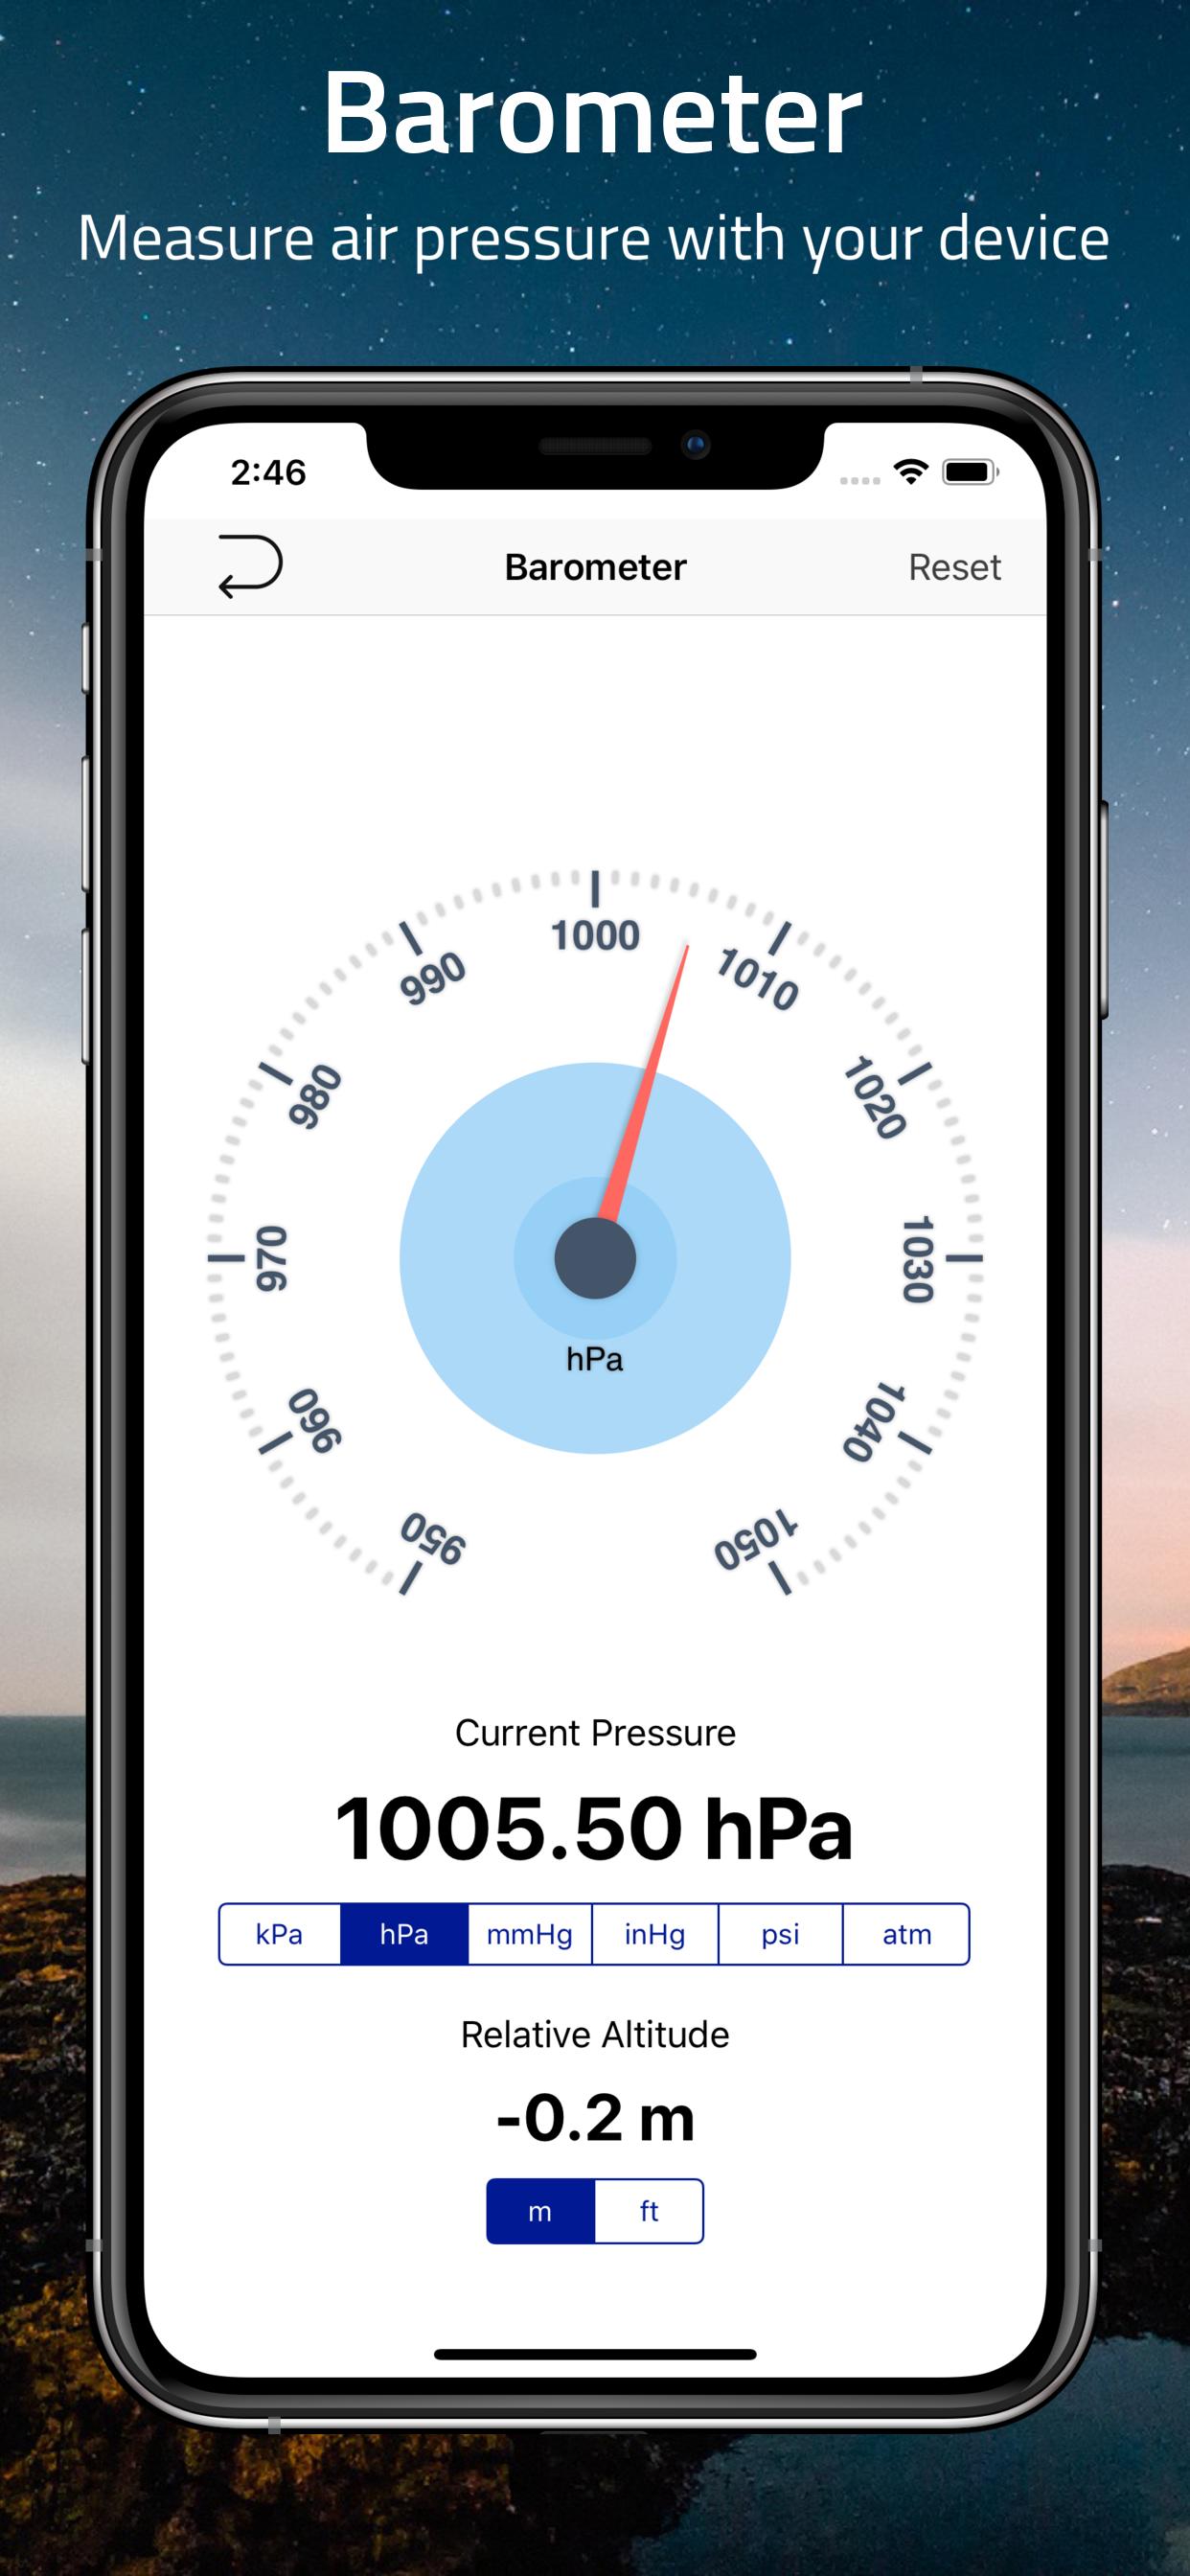 iPhone Xs Max-03Elevation - Barometer_framed.png